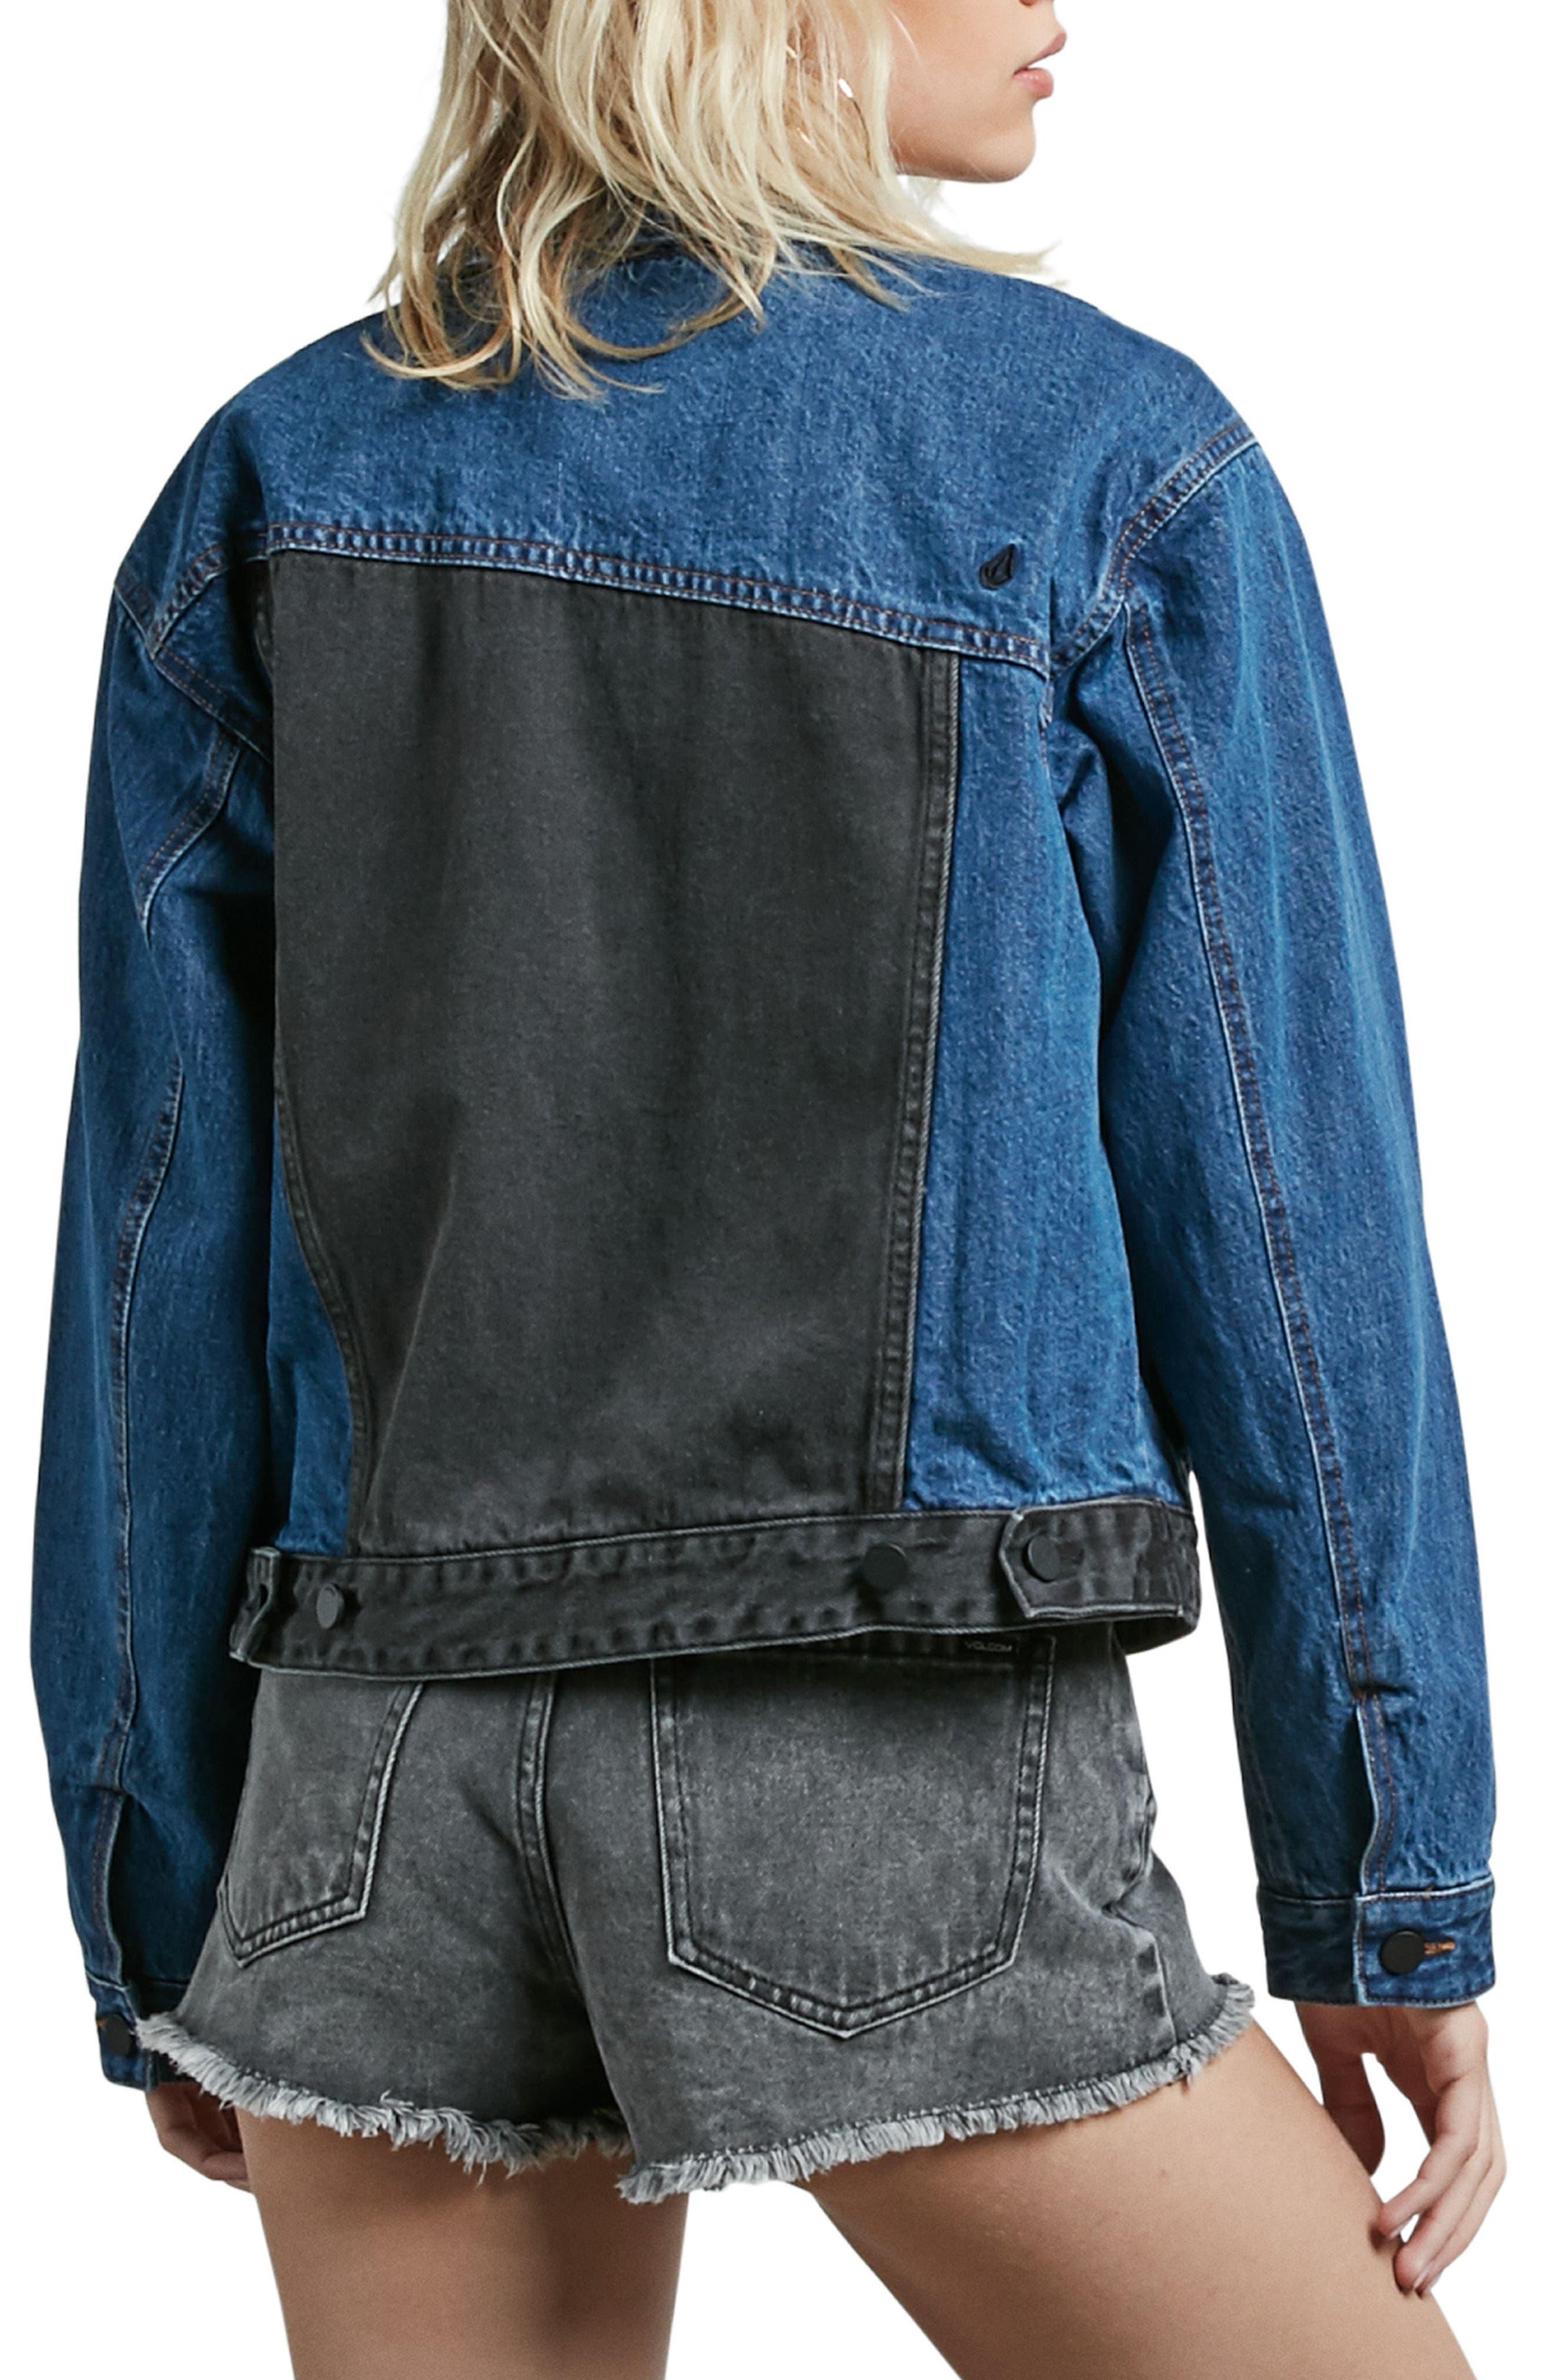 1991 Colorblock Denim Jacket,                             Alternate thumbnail 2, color,